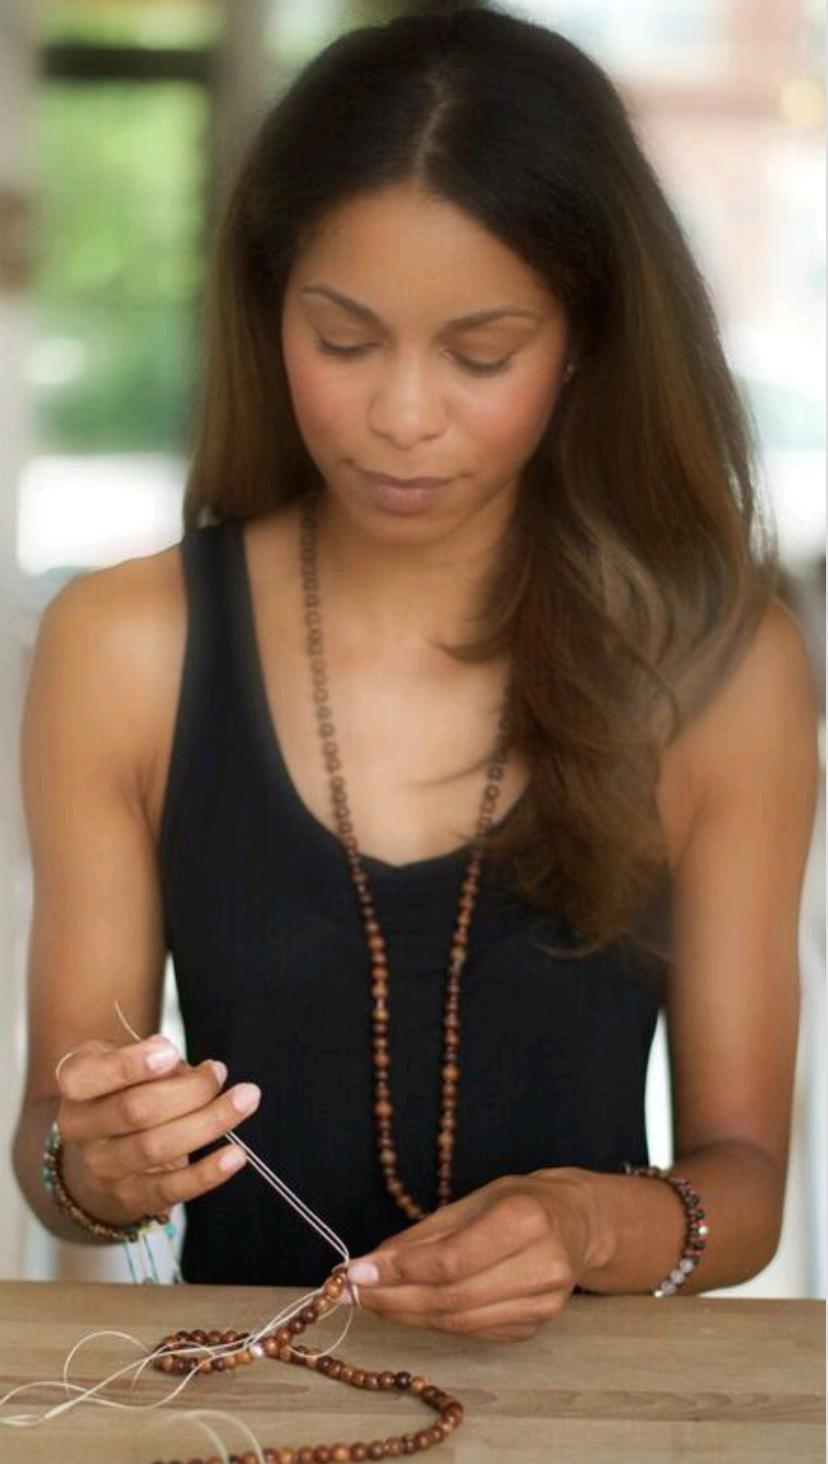 Free Soul Malas founder Leah Brathwaite